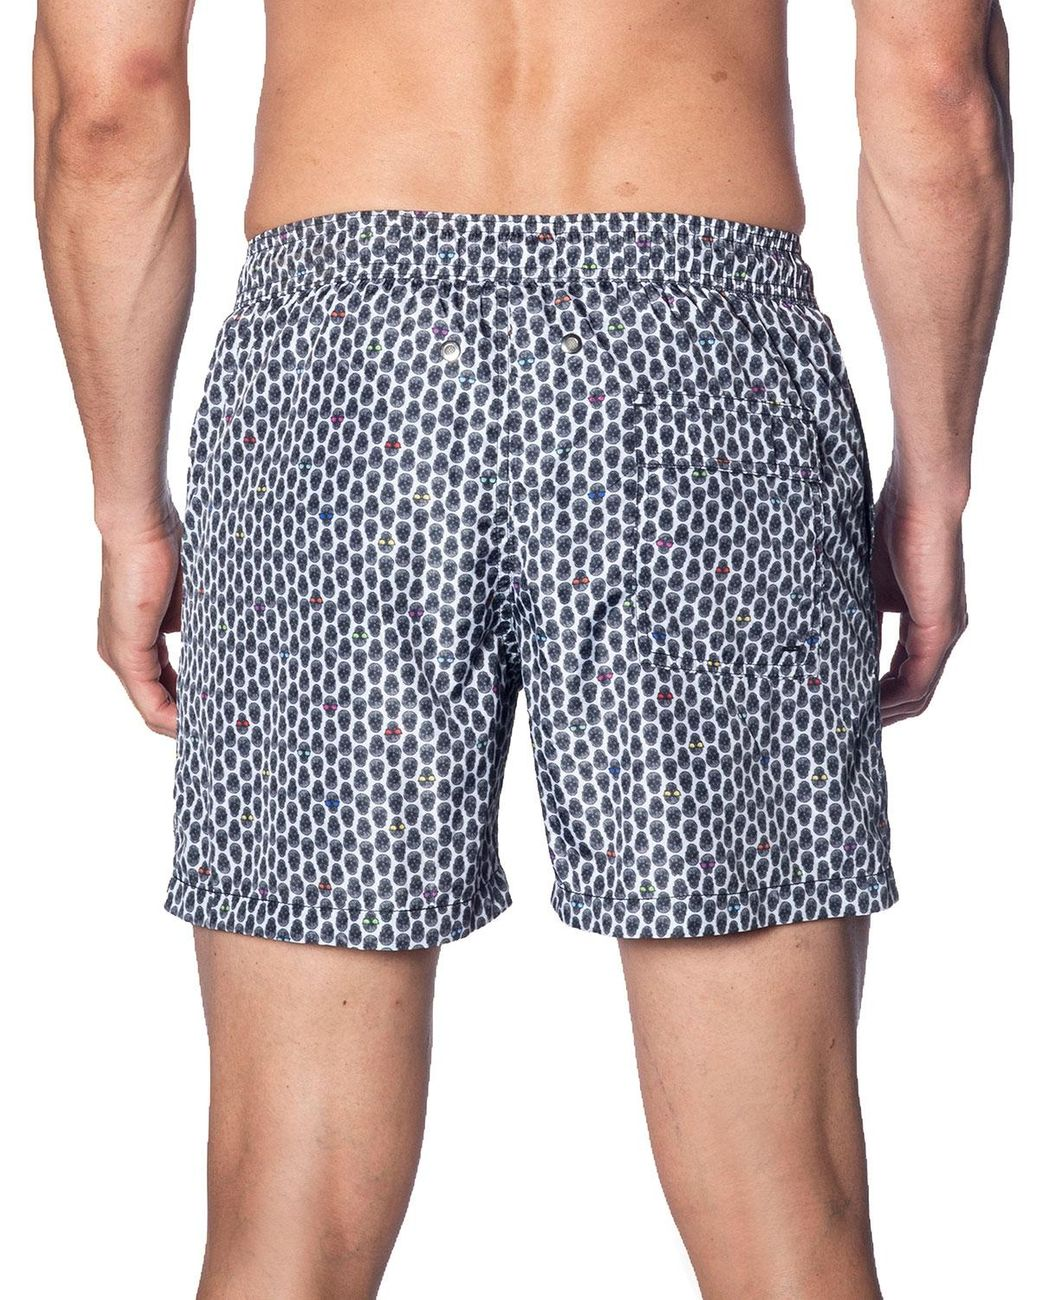 Alangbudu Camouflage Swimsuit Slim Fit Swim Trunks Elastic Waist Drawstring Pocket Beach Board Short Athletic Durable